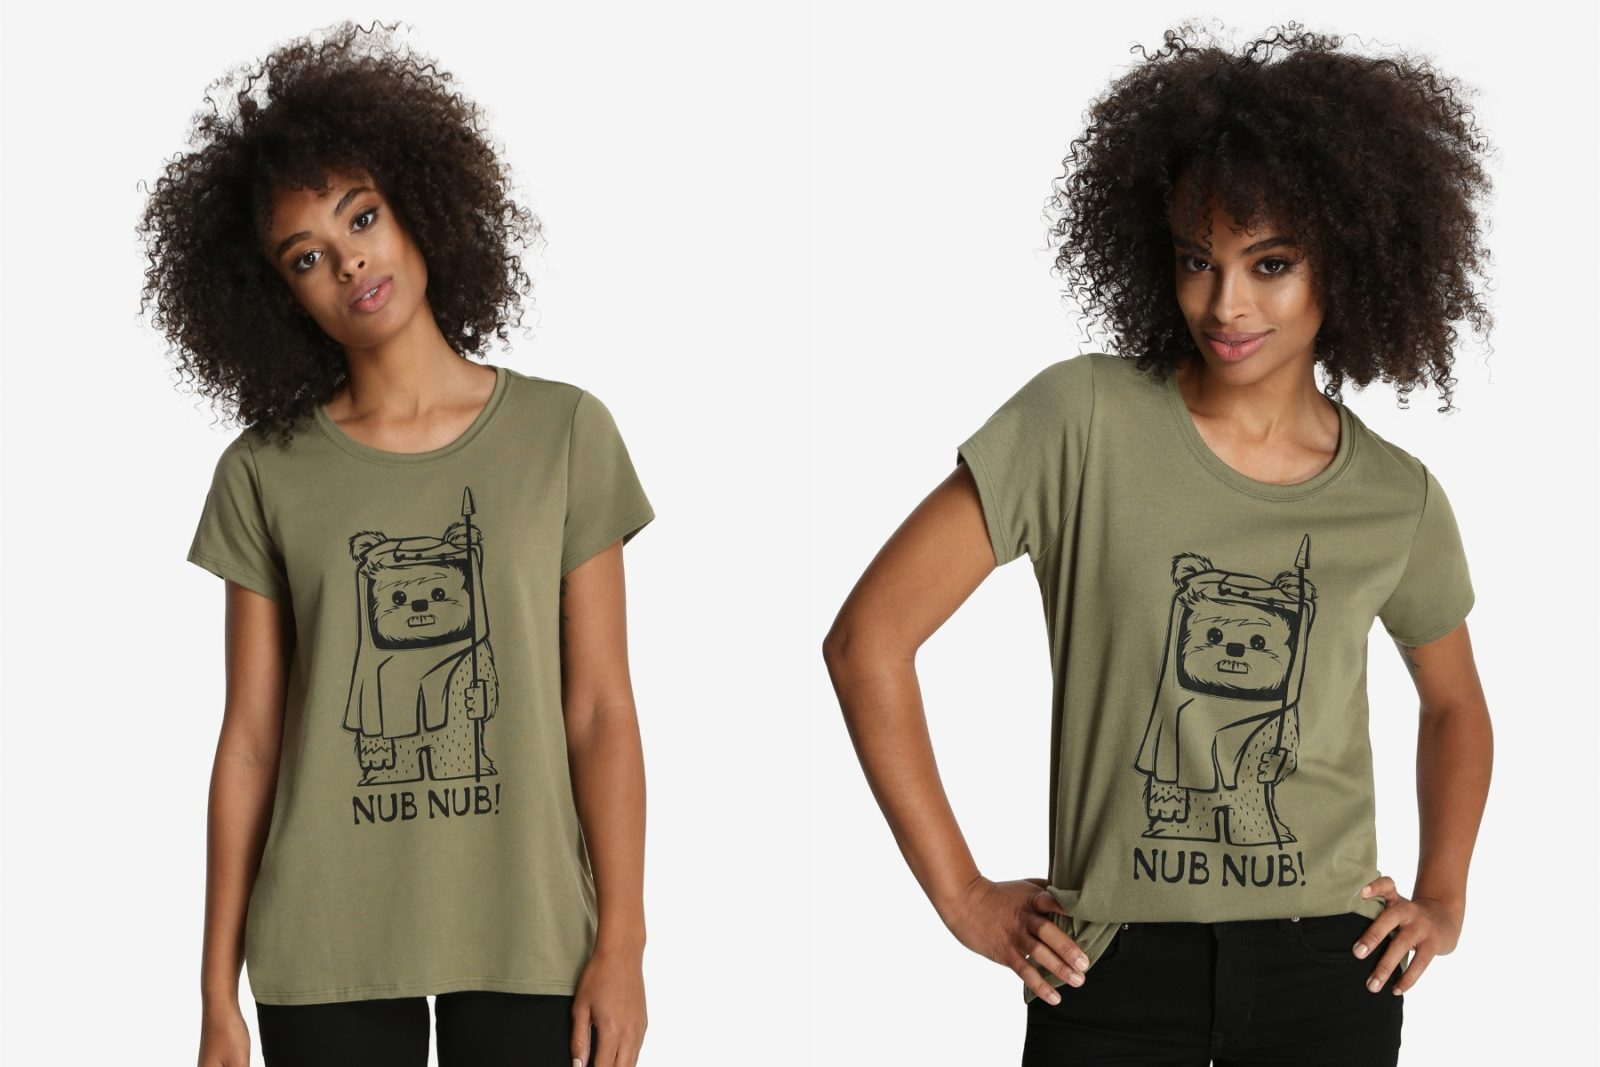 Women's Her Universe Ewok Nub Nub T-shirt